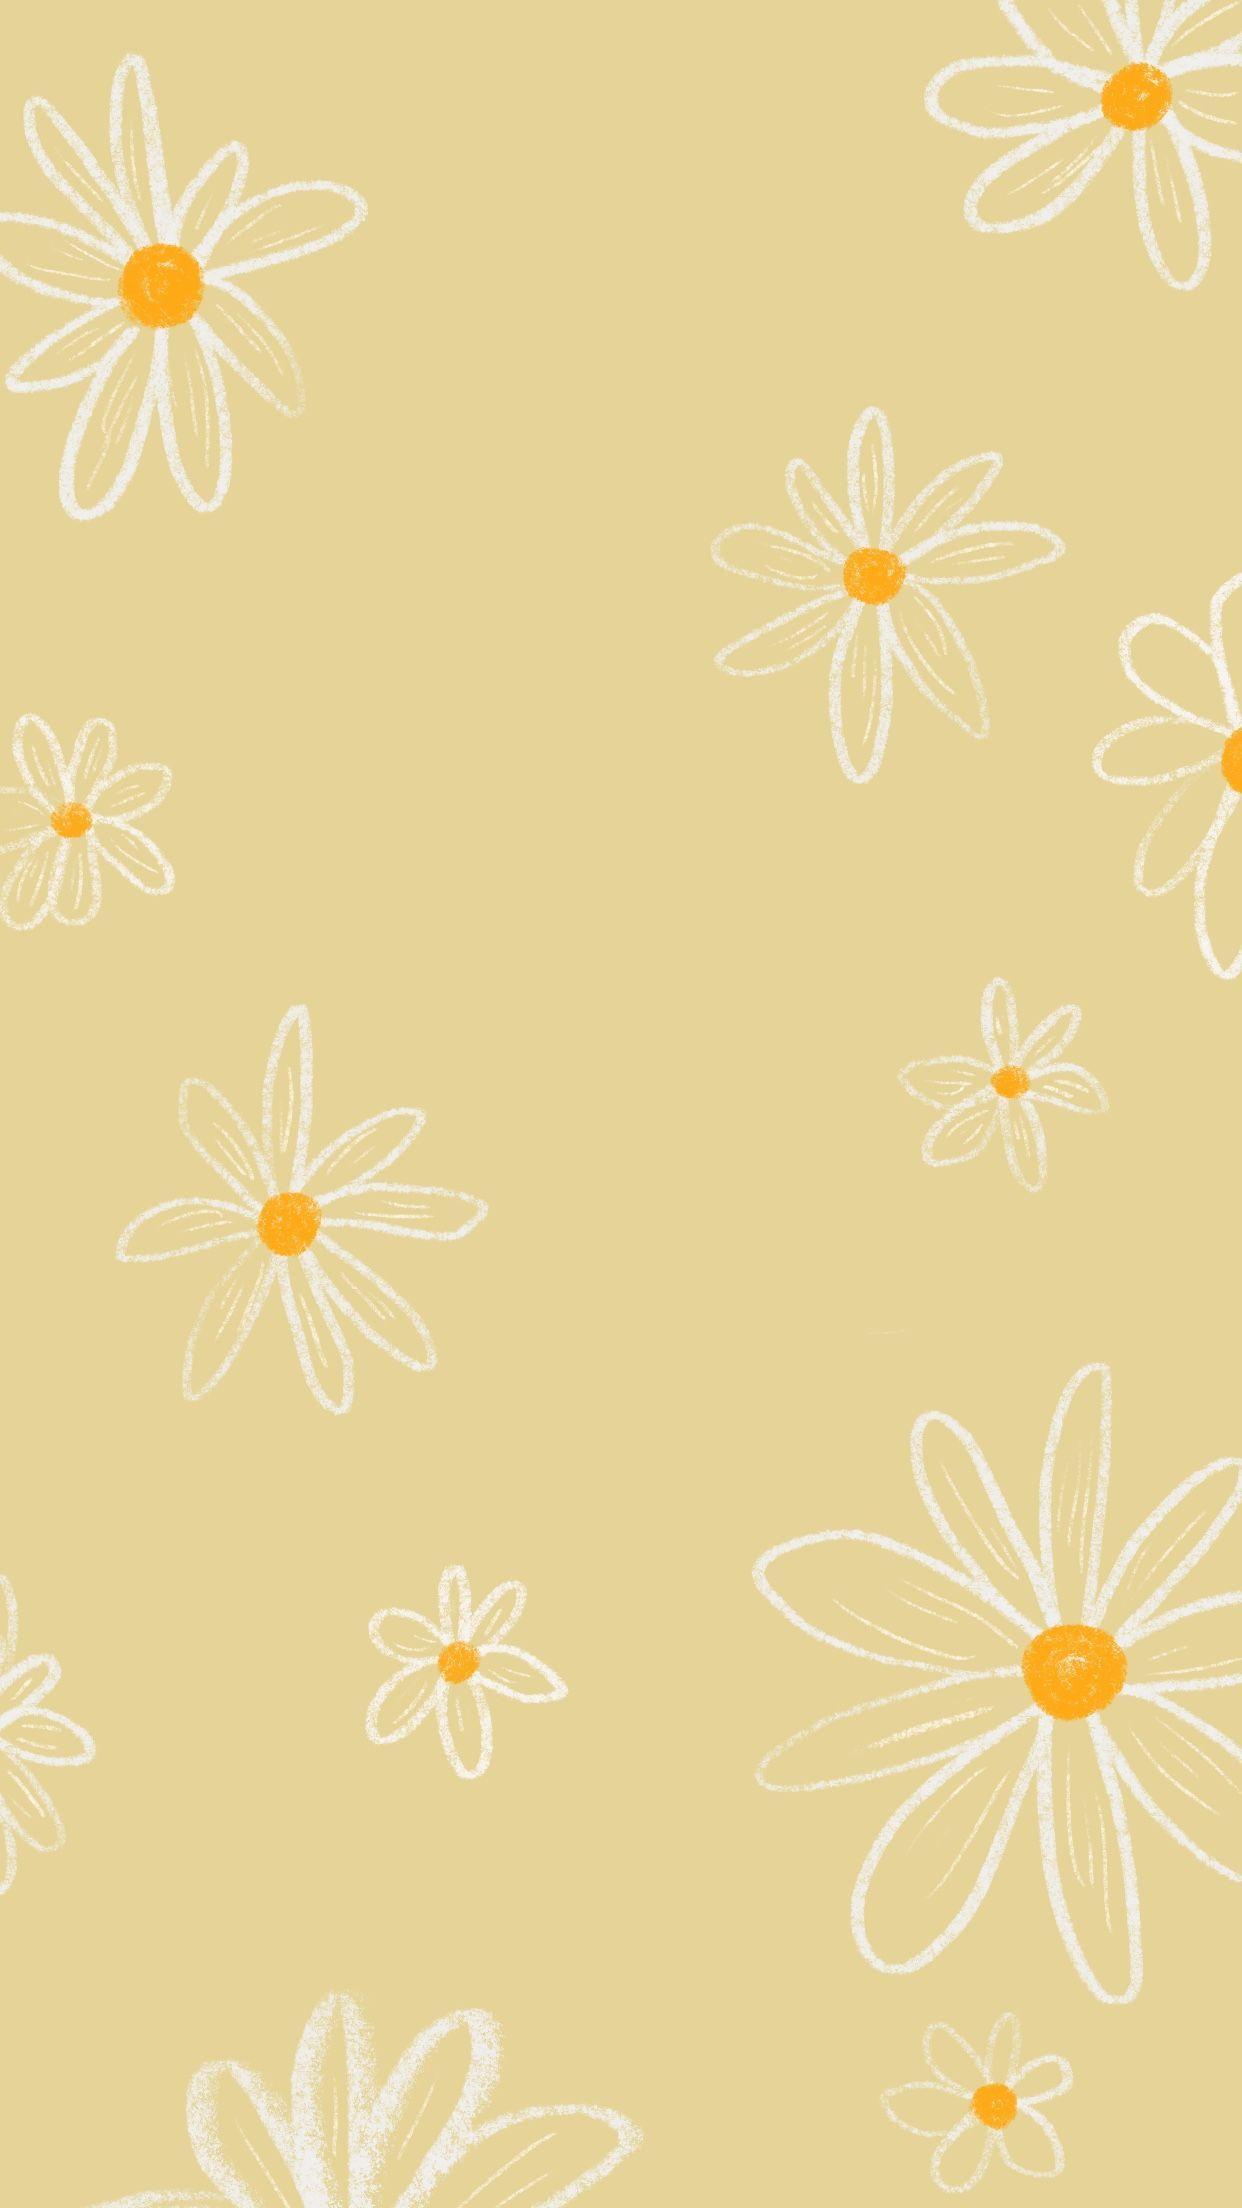 Wallpaper Sunny Yellow Phone Wallpaper Boho Wallpaper Iphone Boho Ipad Air Wallpaper